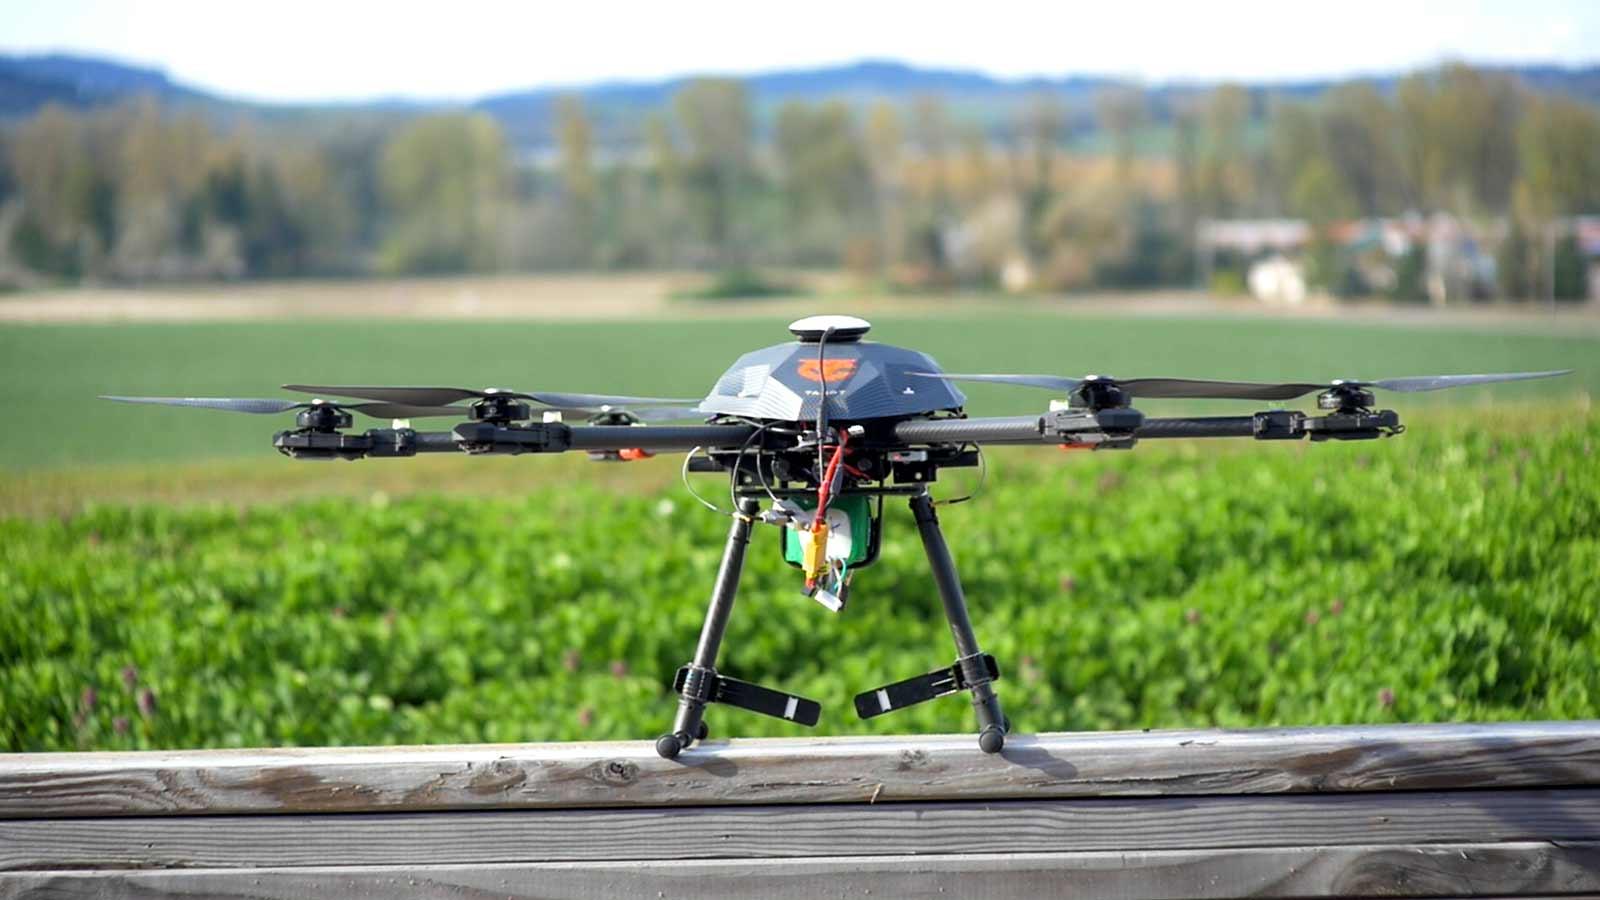 Yamhill Carlton developed their own custom drone